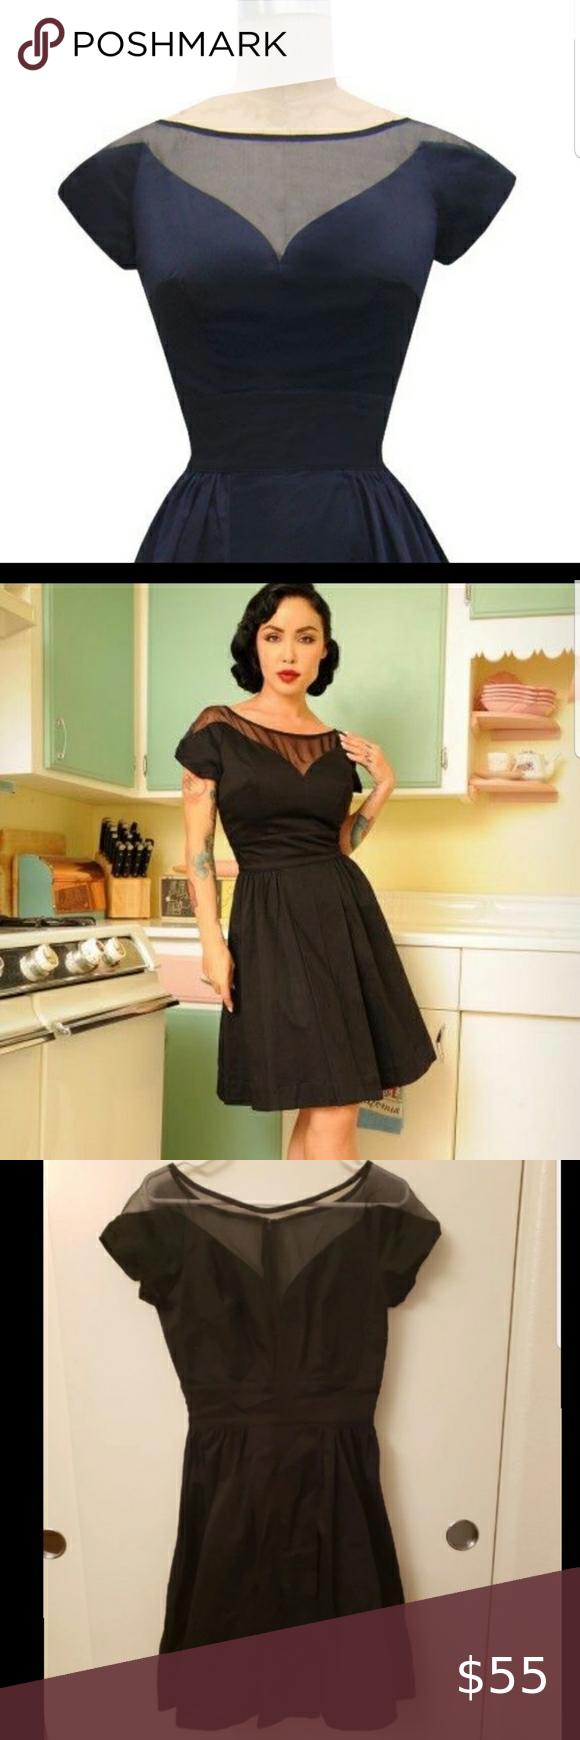 Trashy Diva Lottie Black Dress Black Dress Necklines For Dresses Diva Dress [ 1740 x 580 Pixel ]